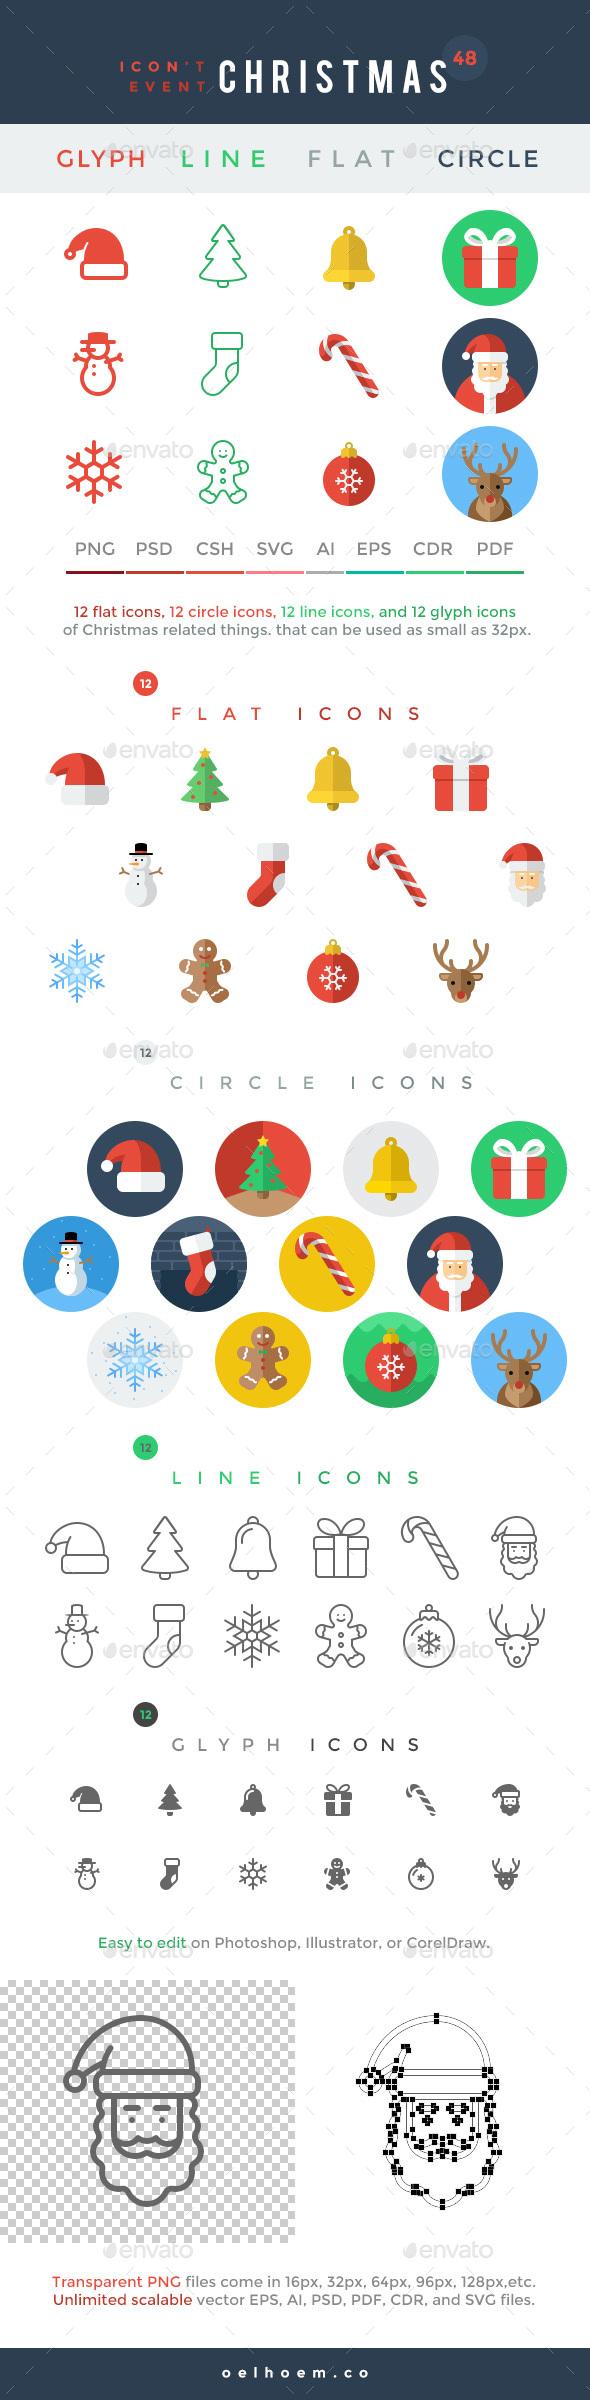 Icon't Event - 48 Christmas Icons - Seasonal Icons